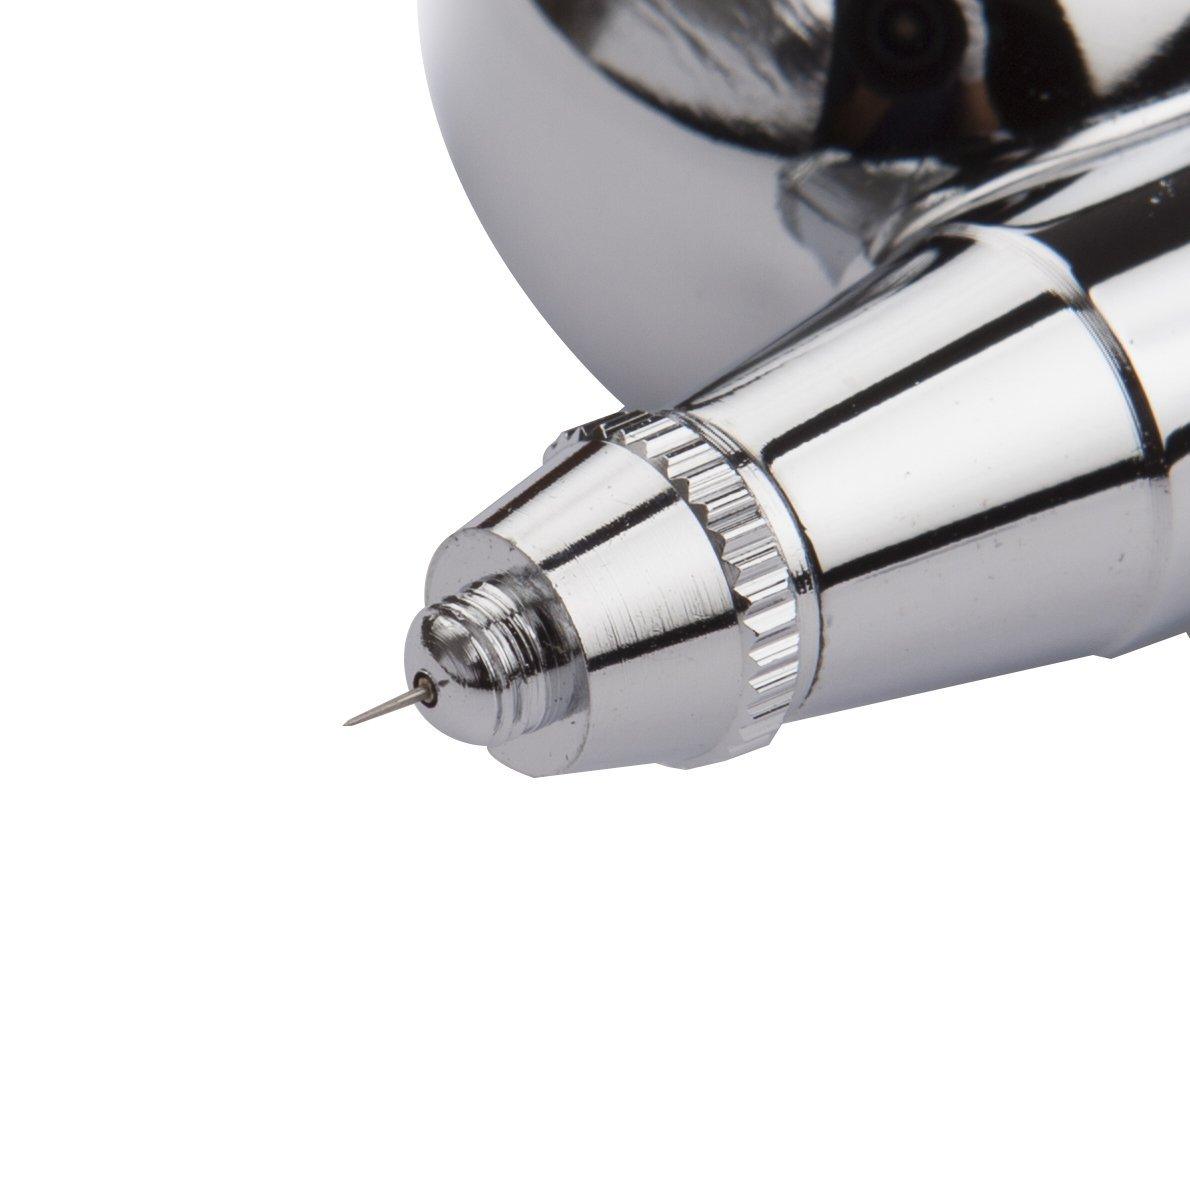 Amazon pinkiou airbrush makeup kit spray gun set with mini amazon pinkiou airbrush makeup kit spray gun set with mini compressor for cake decoration nail painting temporary tattoo hobby artblack arts prinsesfo Choice Image